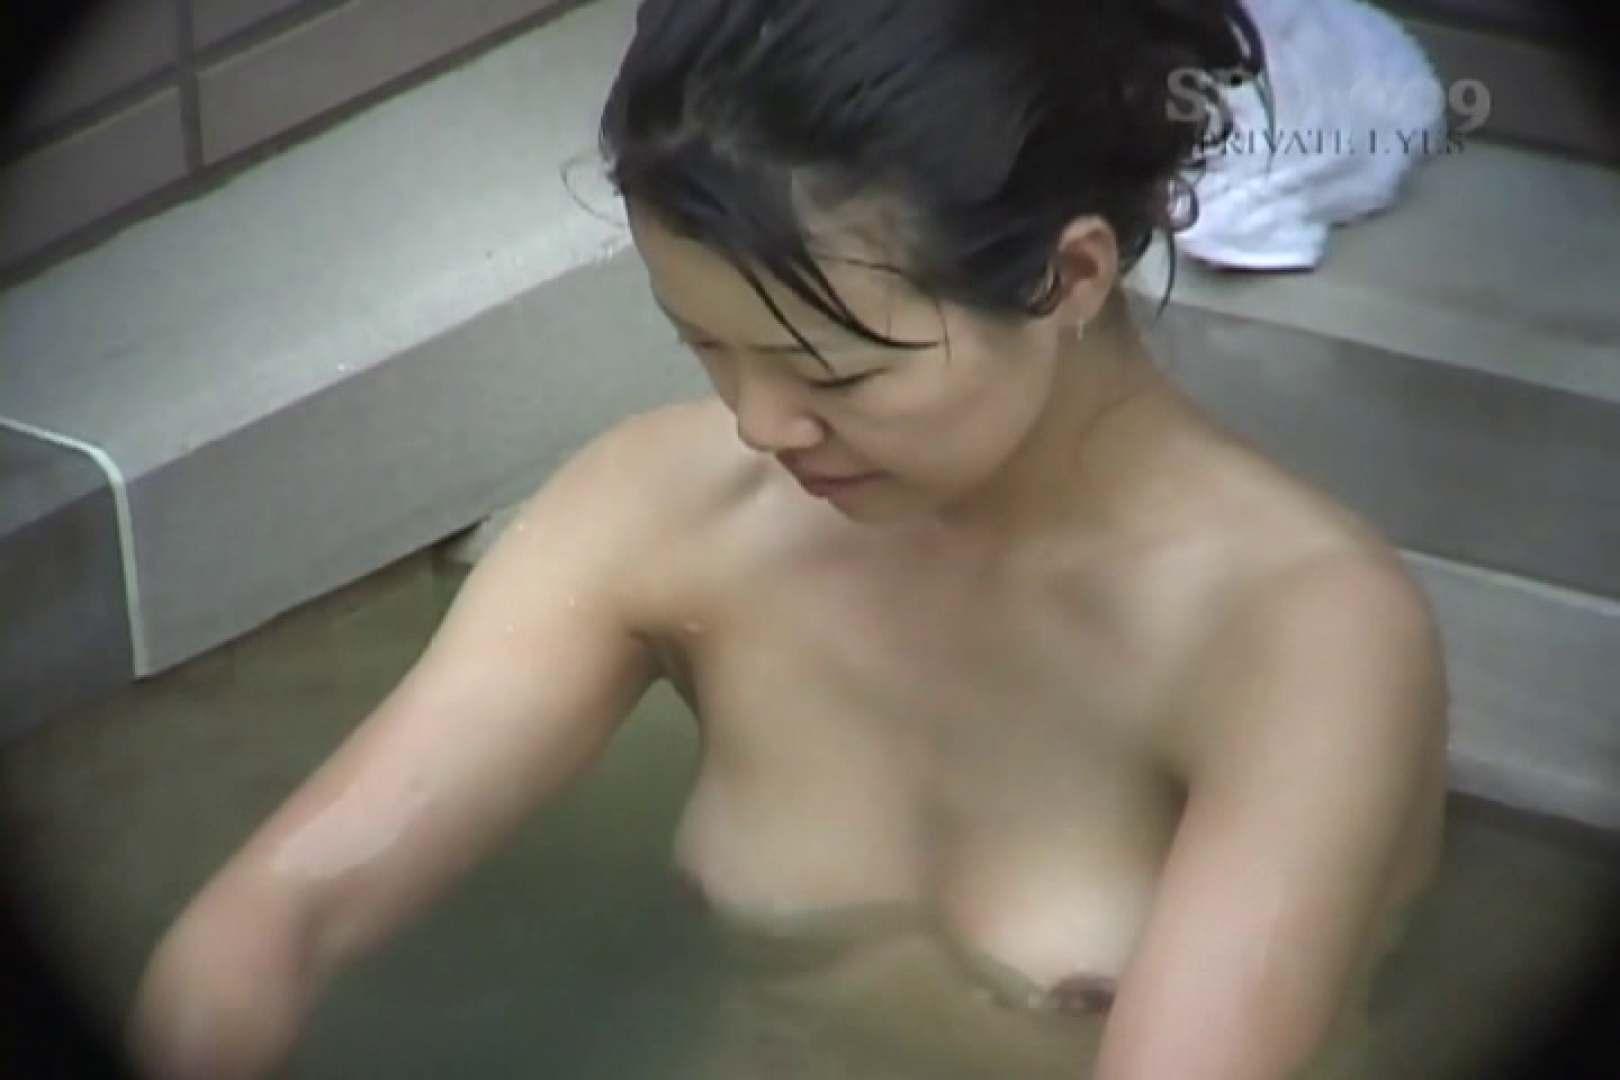 高画質版!SPD-009 新・露天浴場 2 高画質 隠し撮りAV無料 78画像 62